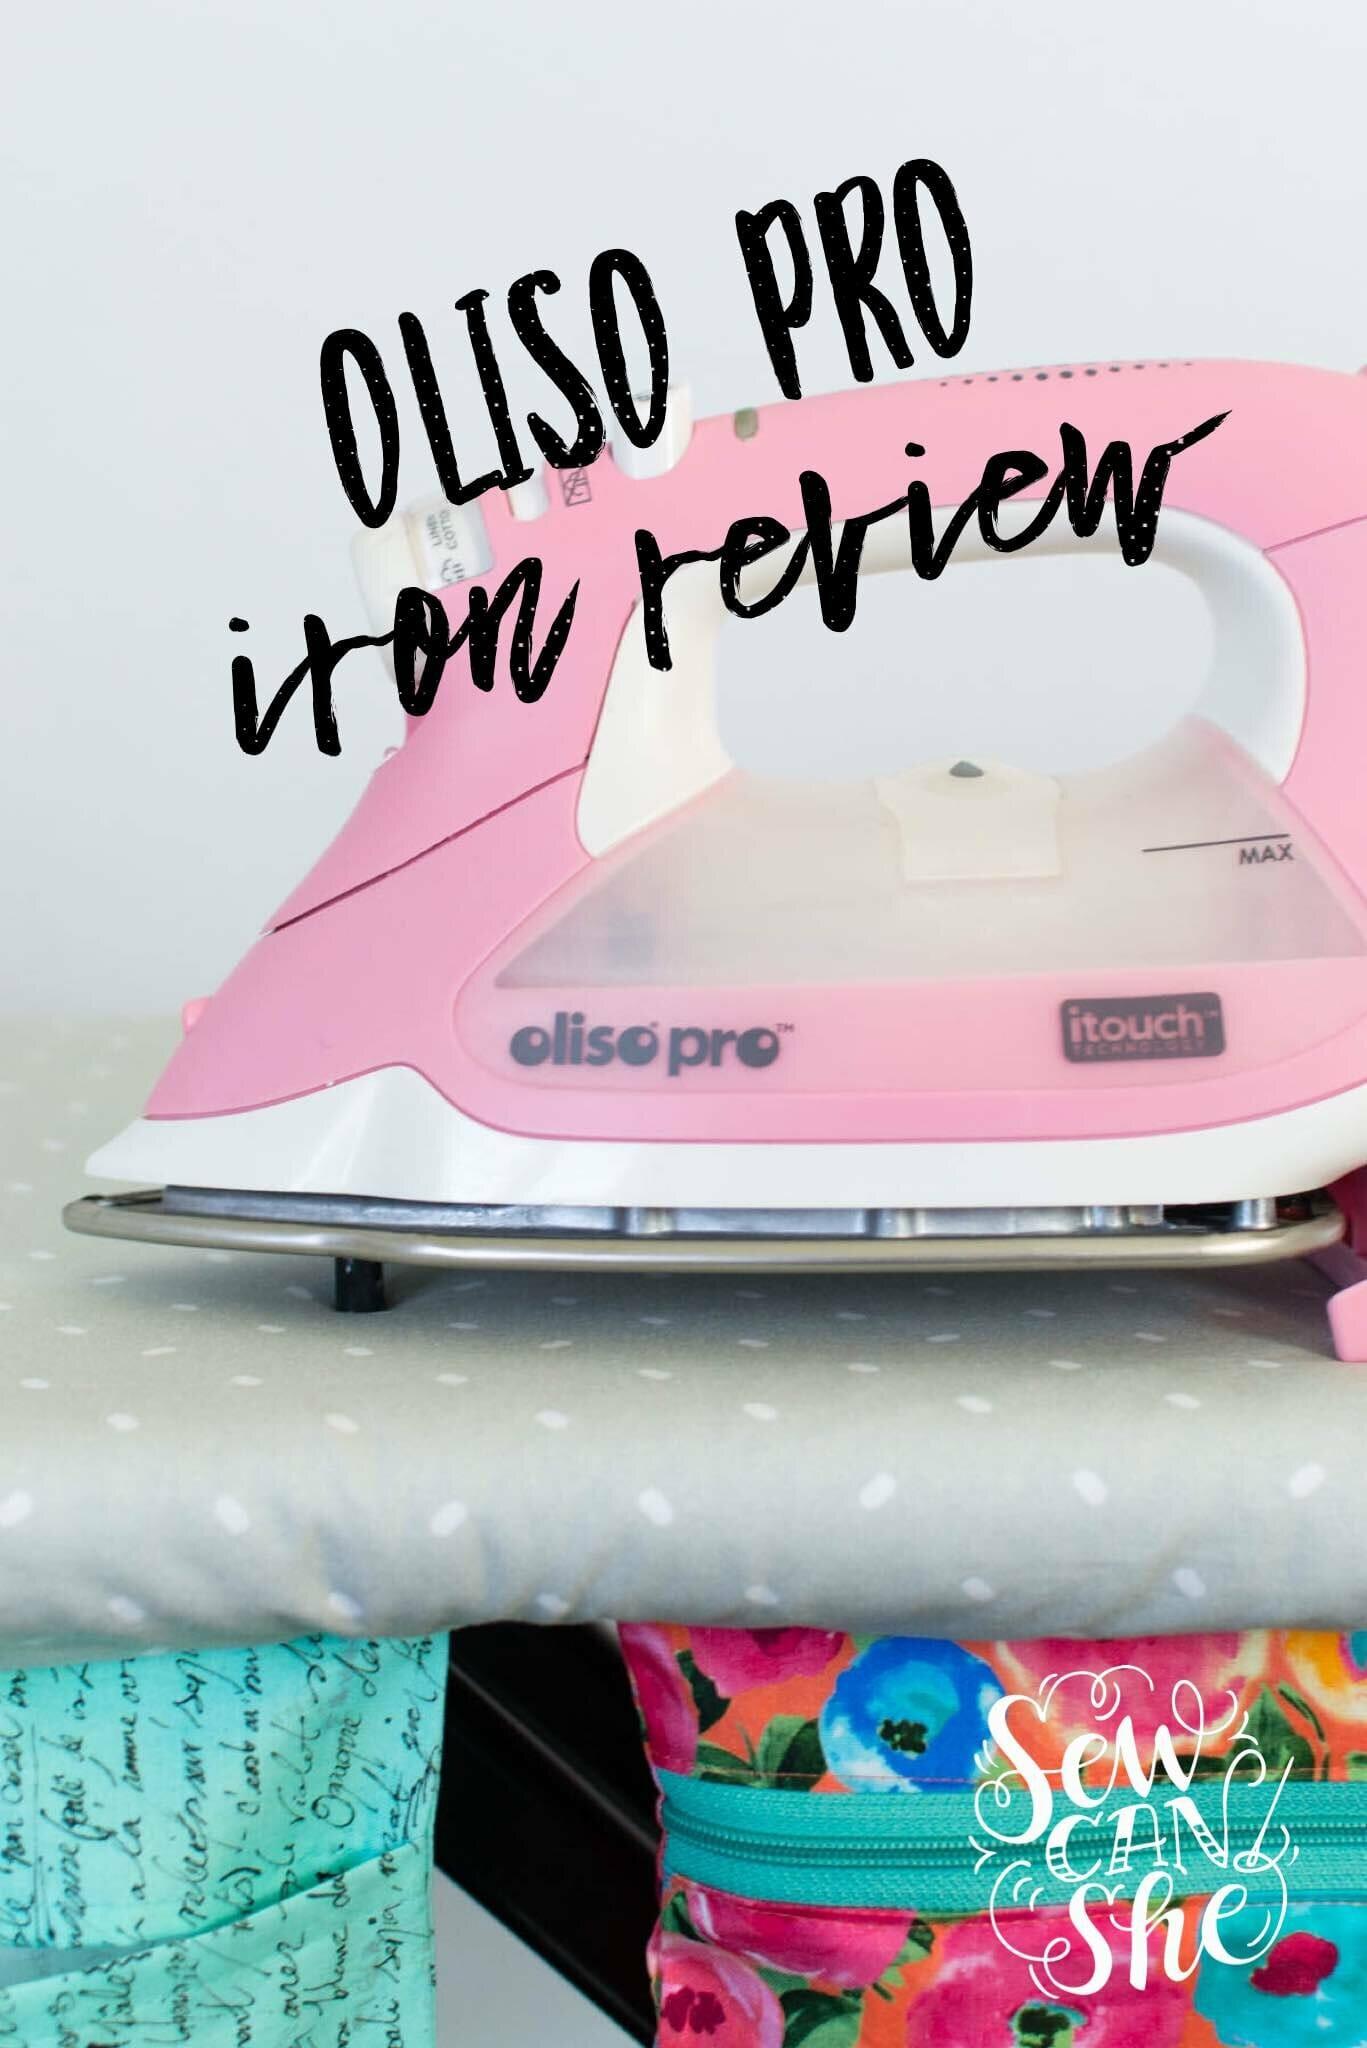 oliso pro smart iron review